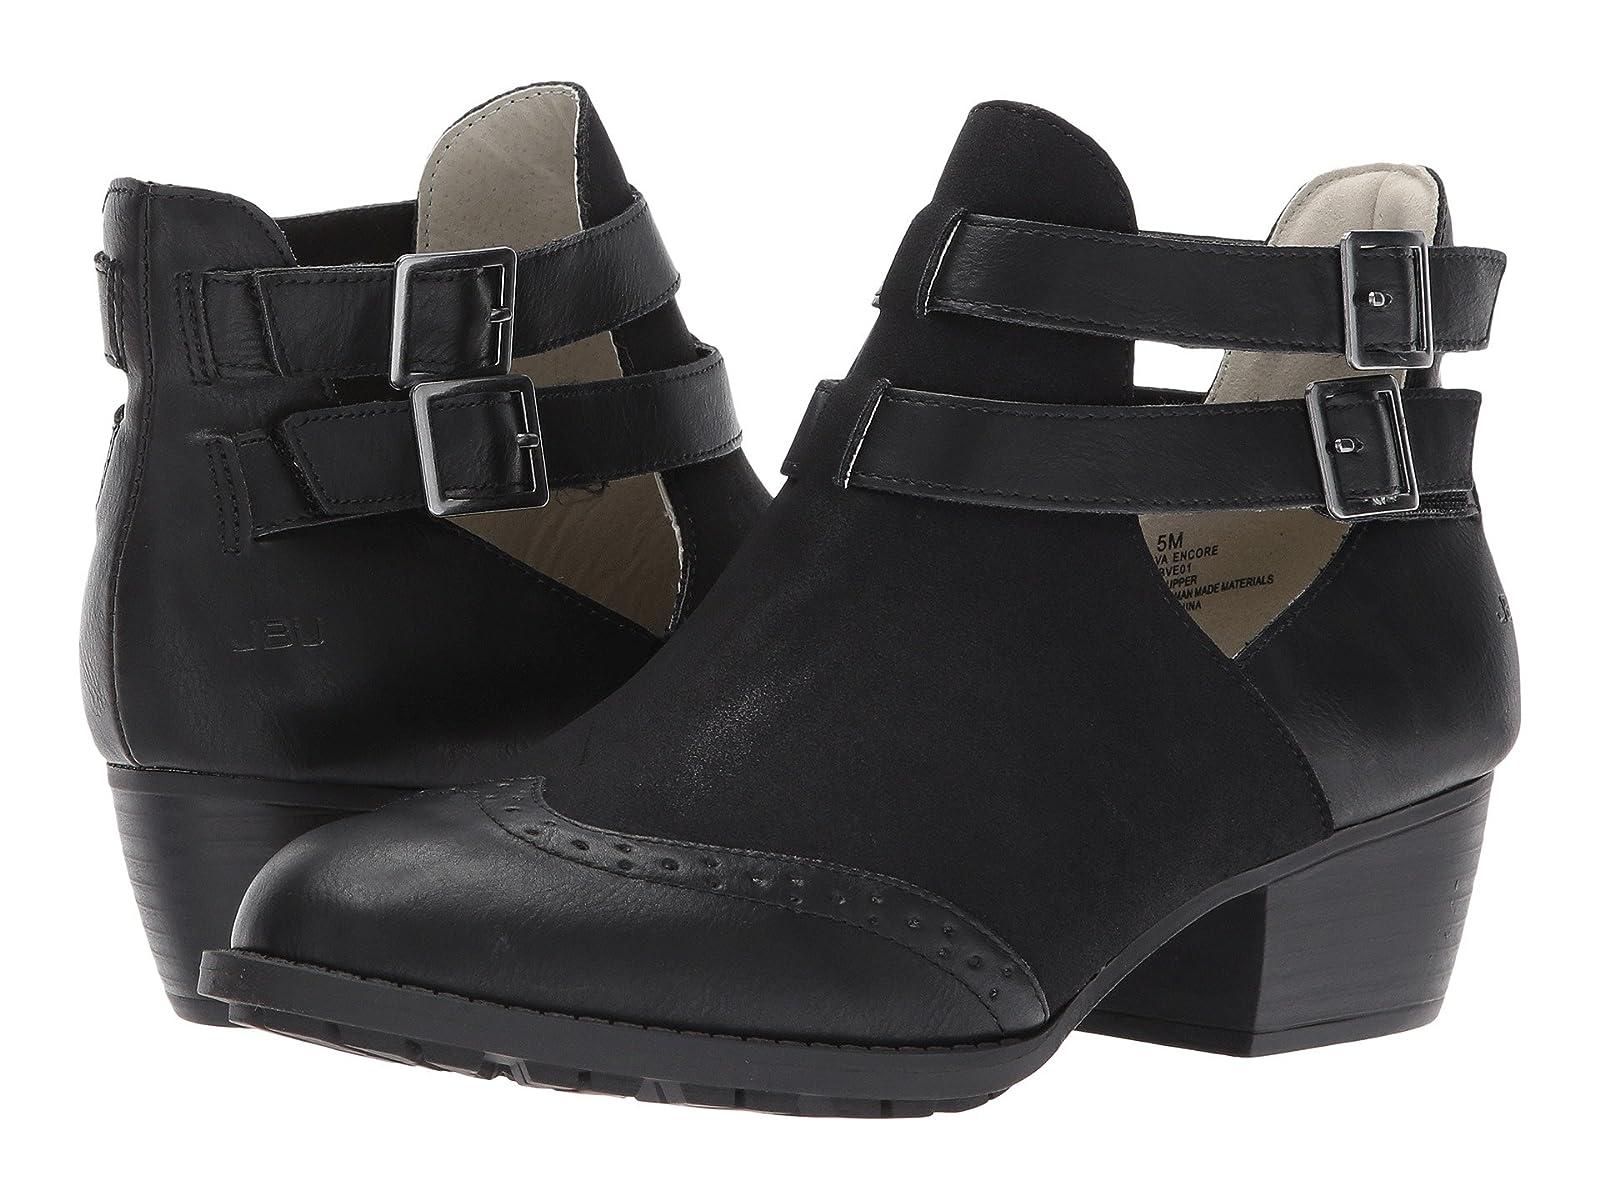 JBU Brava EncoreAffordable and distinctive shoes